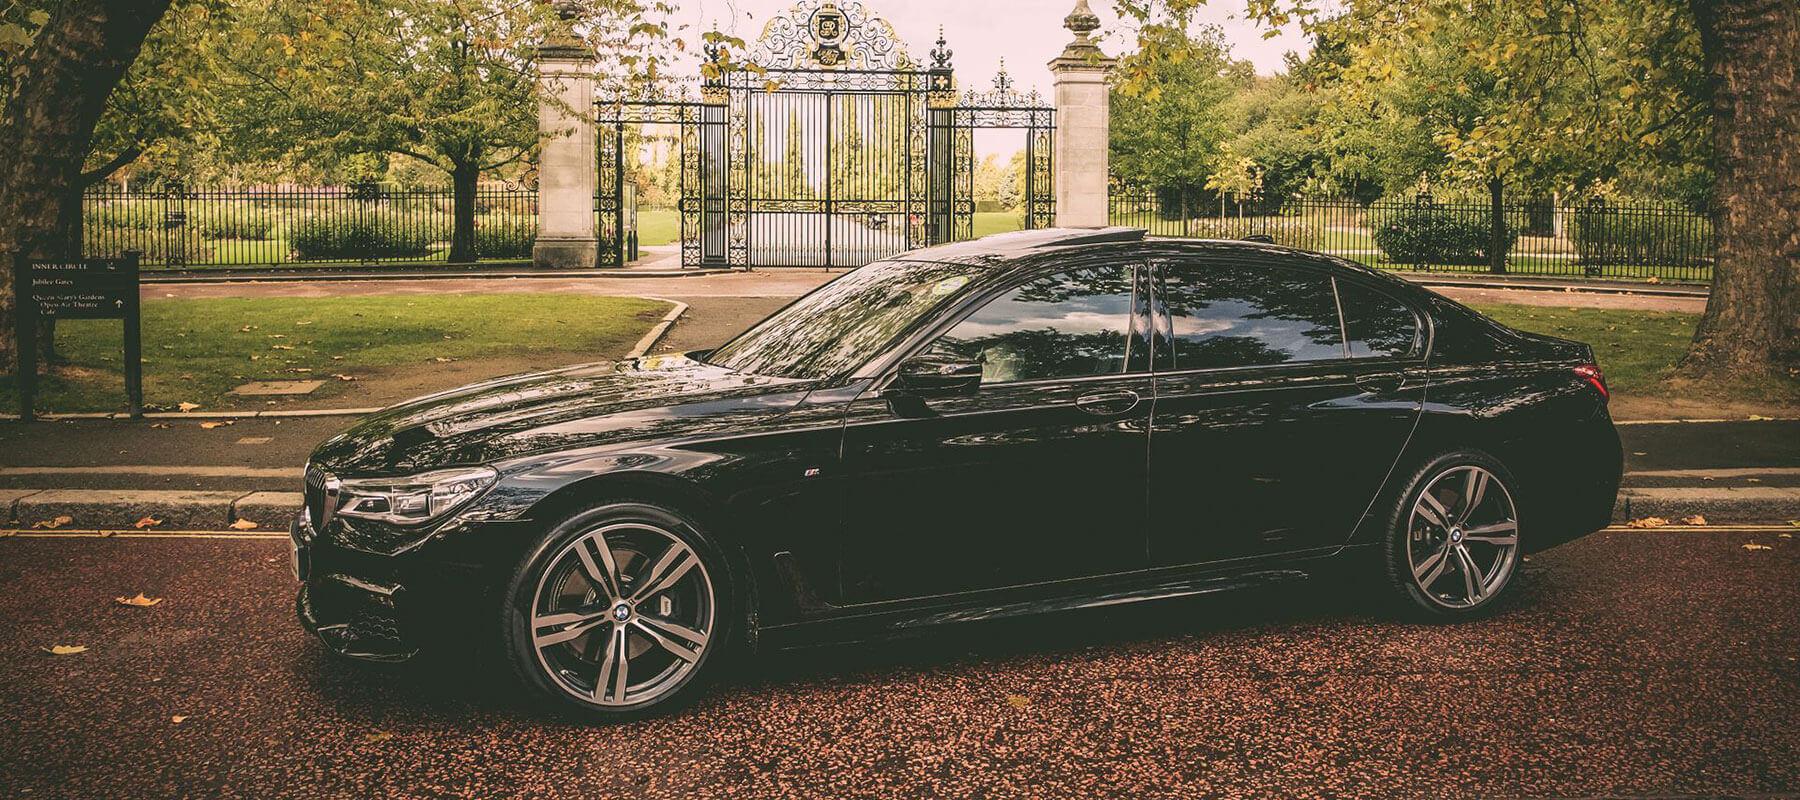 BMW 7 Series in Park